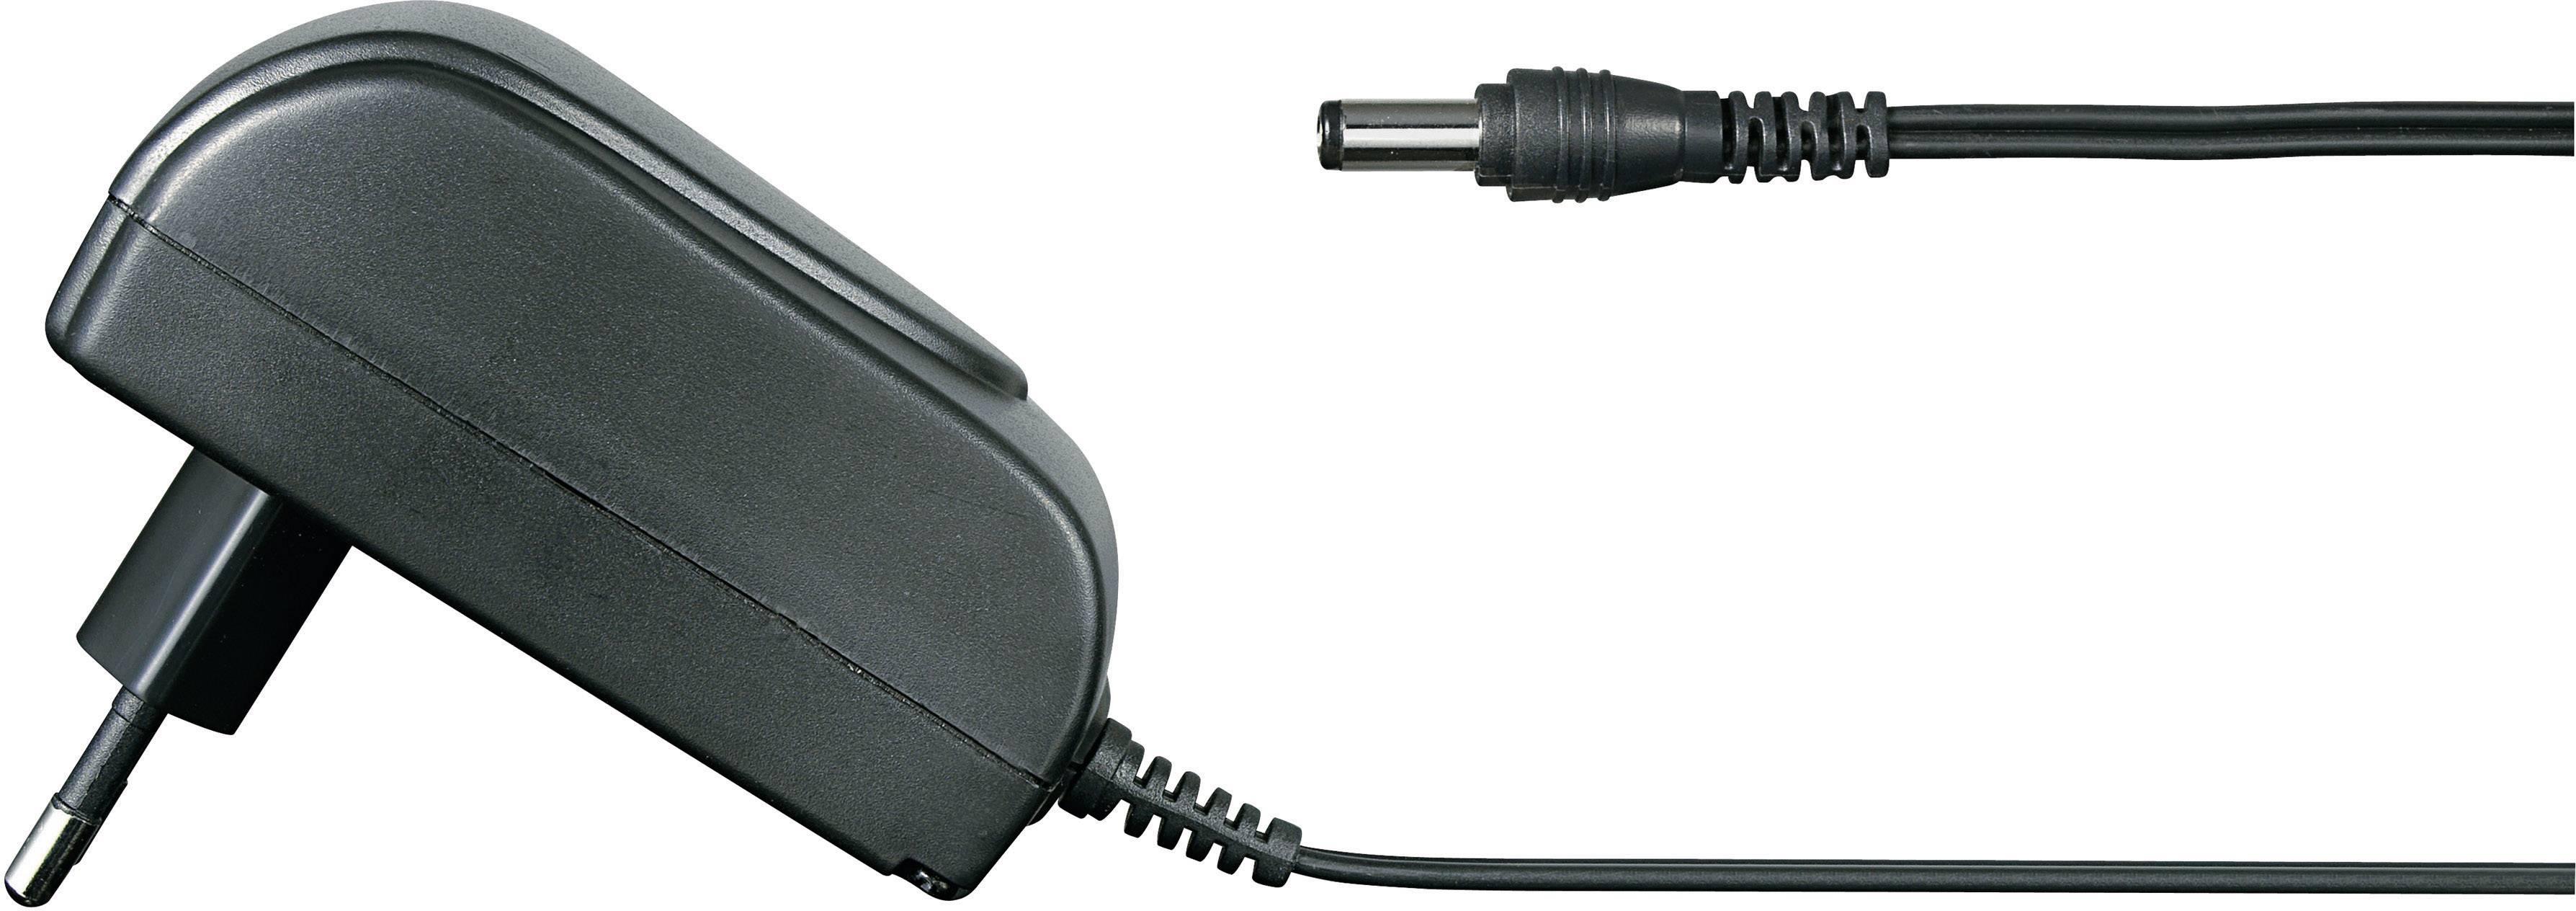 Síťový adaptér Voltcraft FPPS 24-18W, 24 V/DC, 18 W